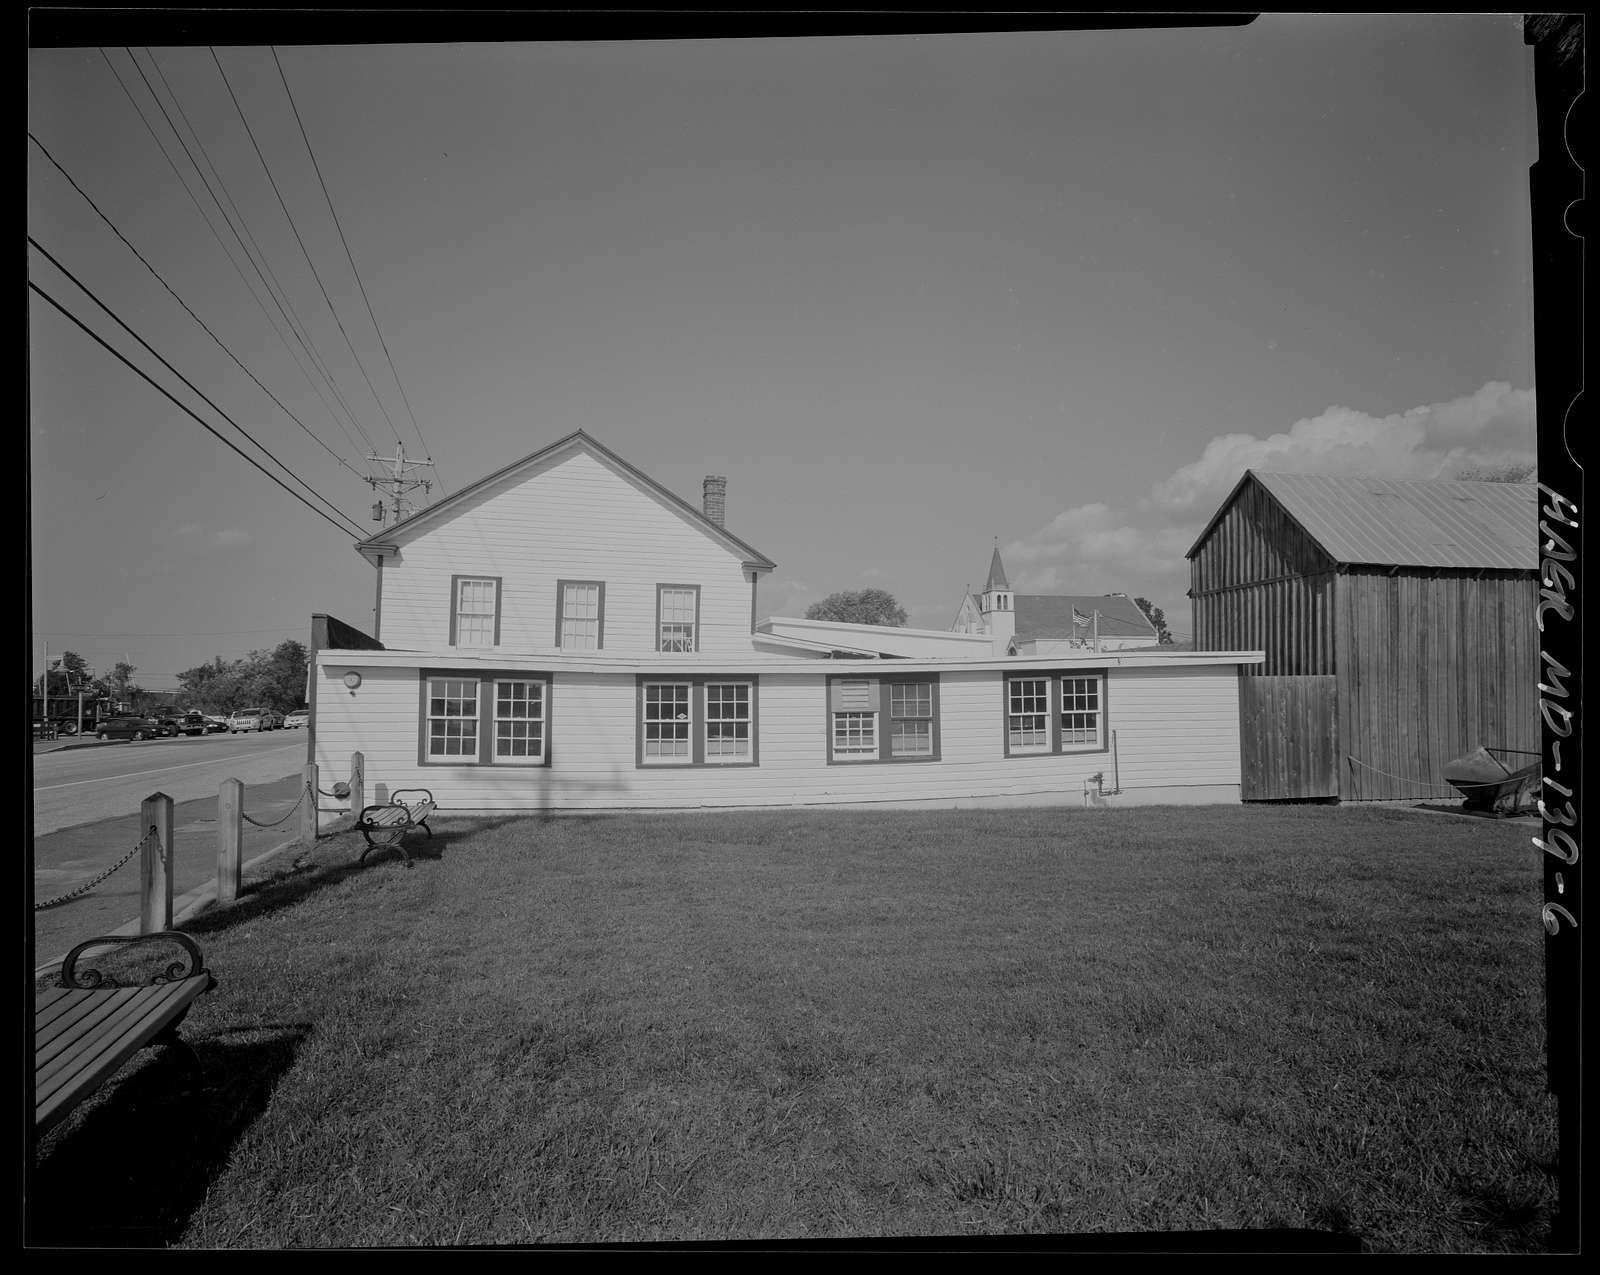 J.C. Lore Oyster House, 14430 Solomons Island Road, Solomons, Calvert County, MD